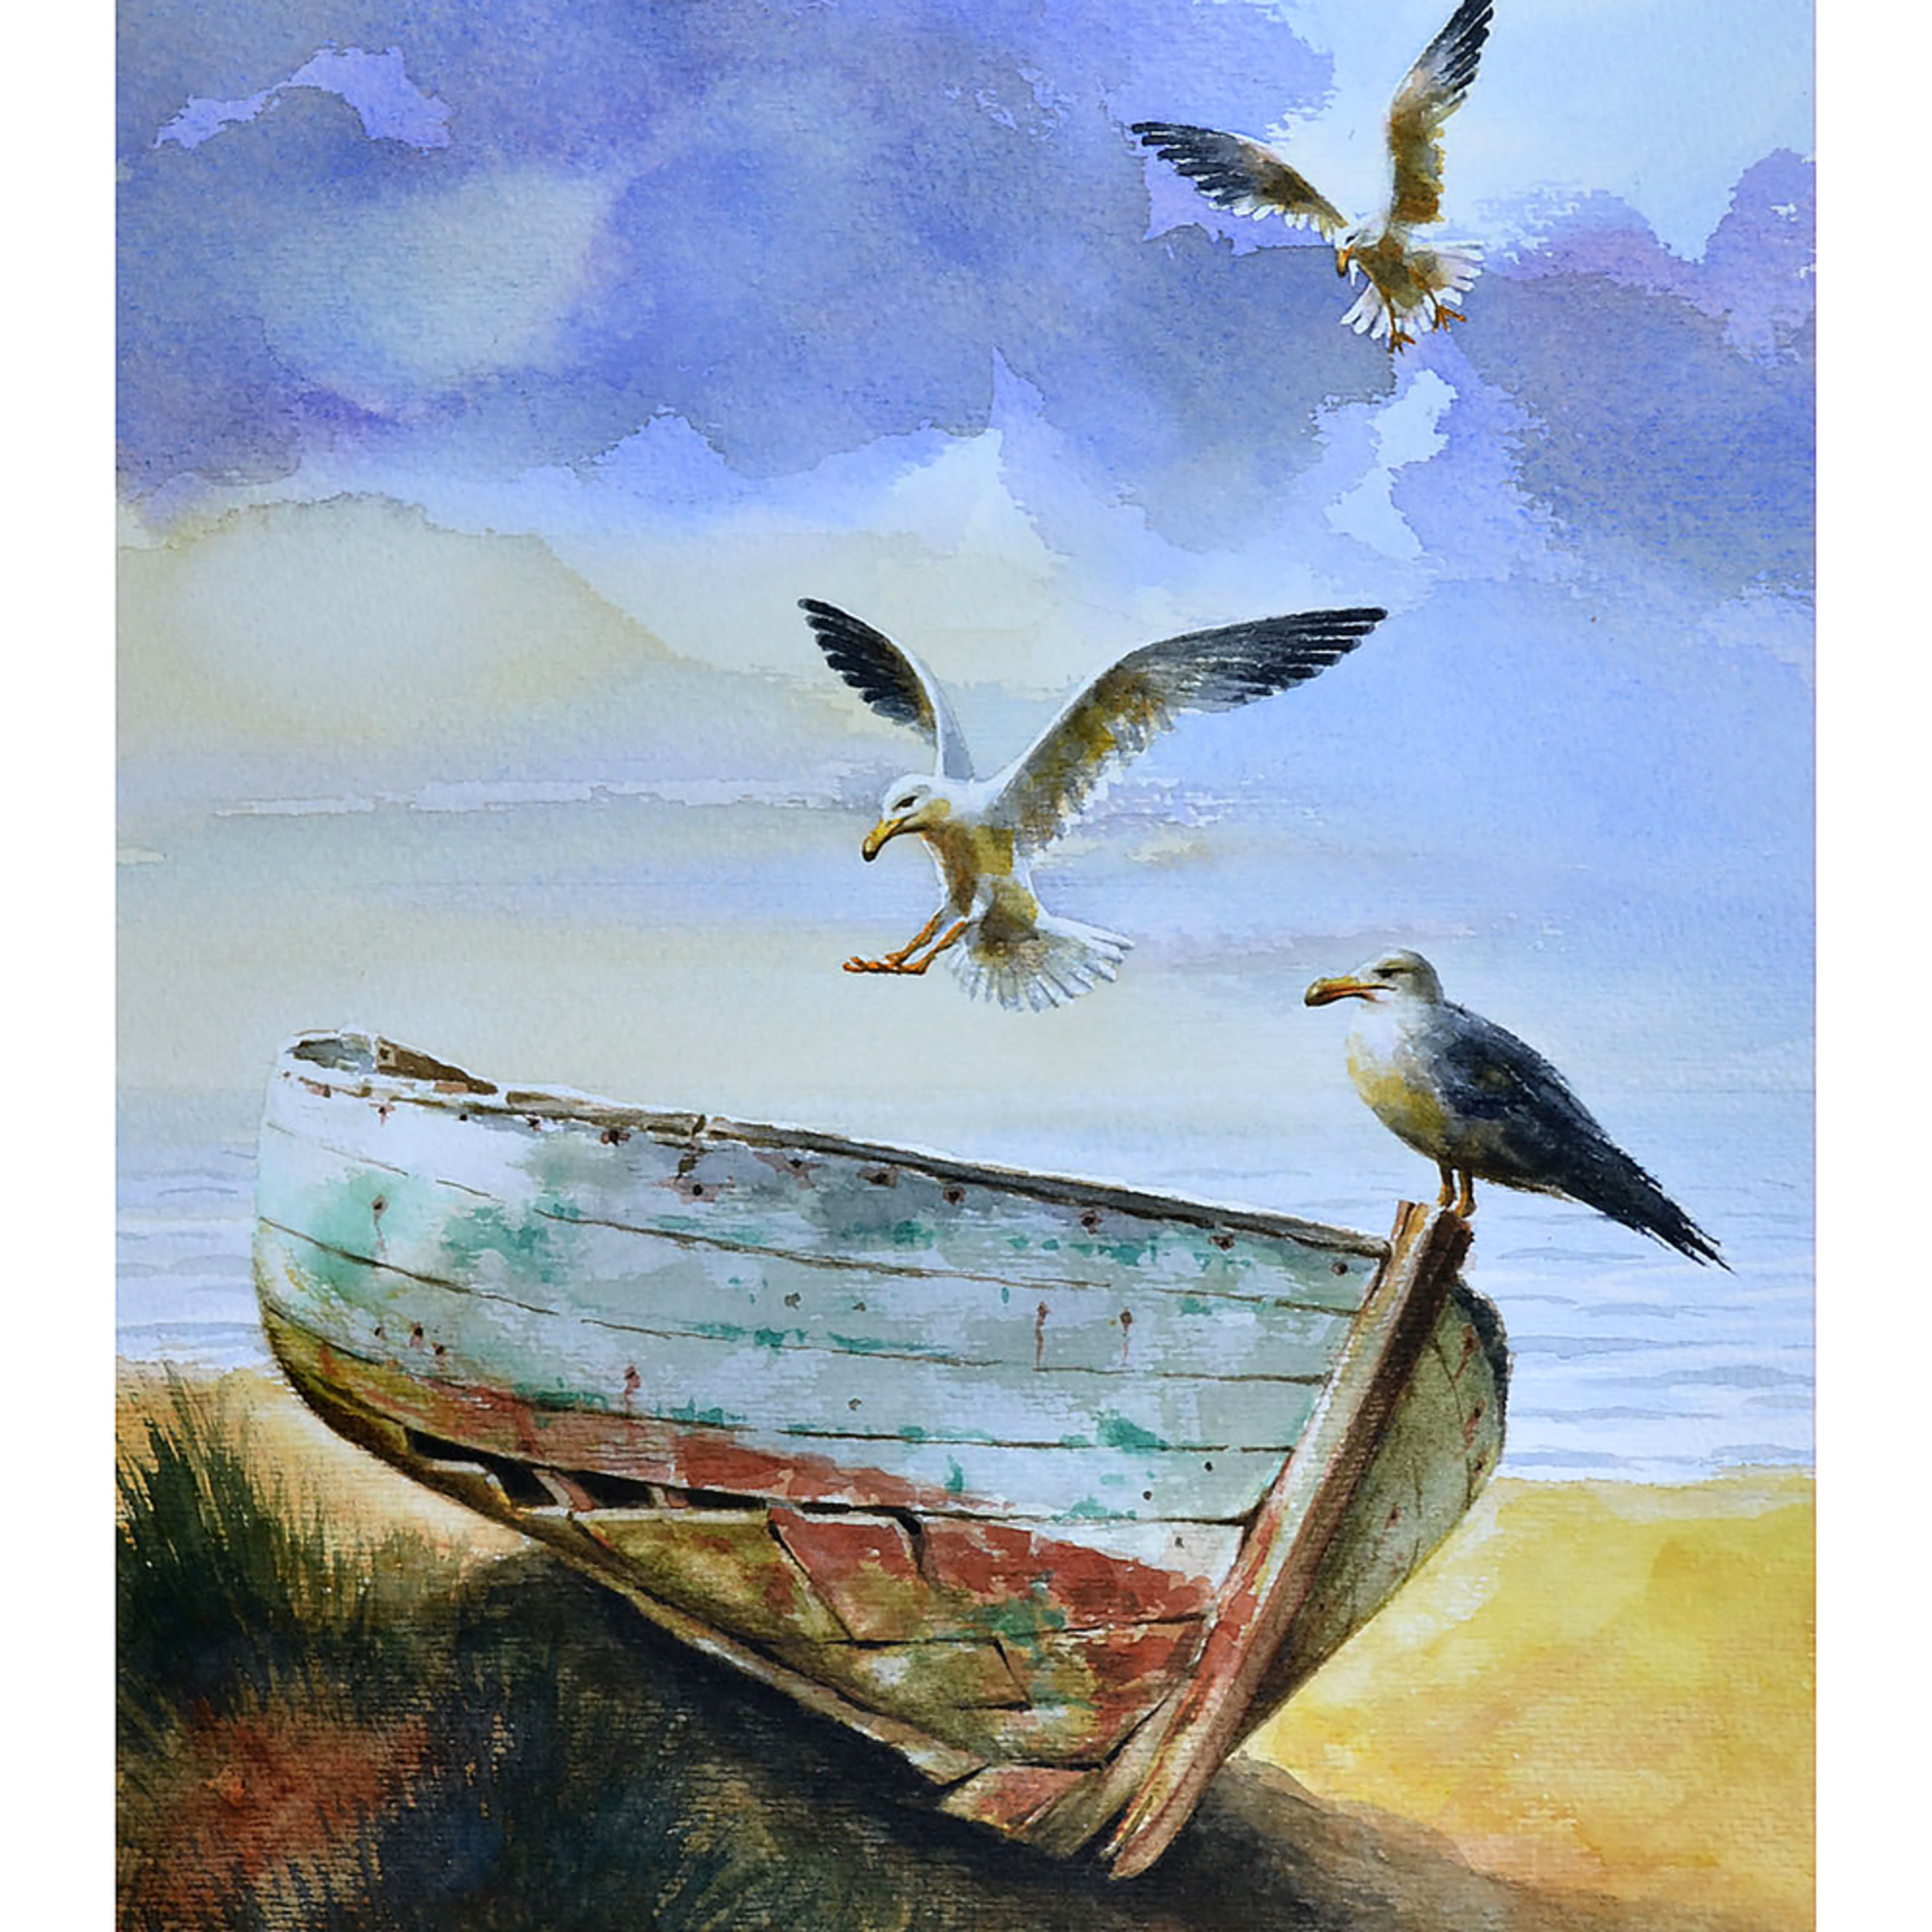 Seagulls.over.row.boat epszqt